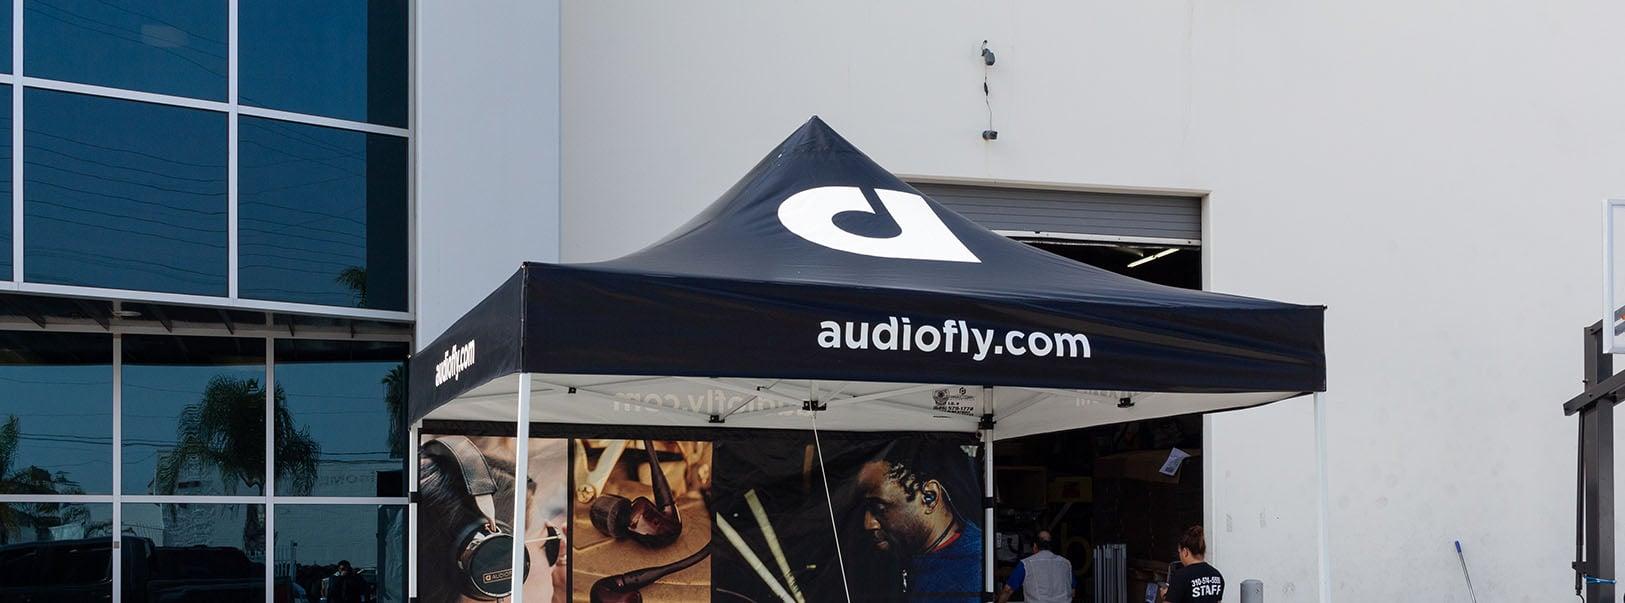 audiofly-header.jpg